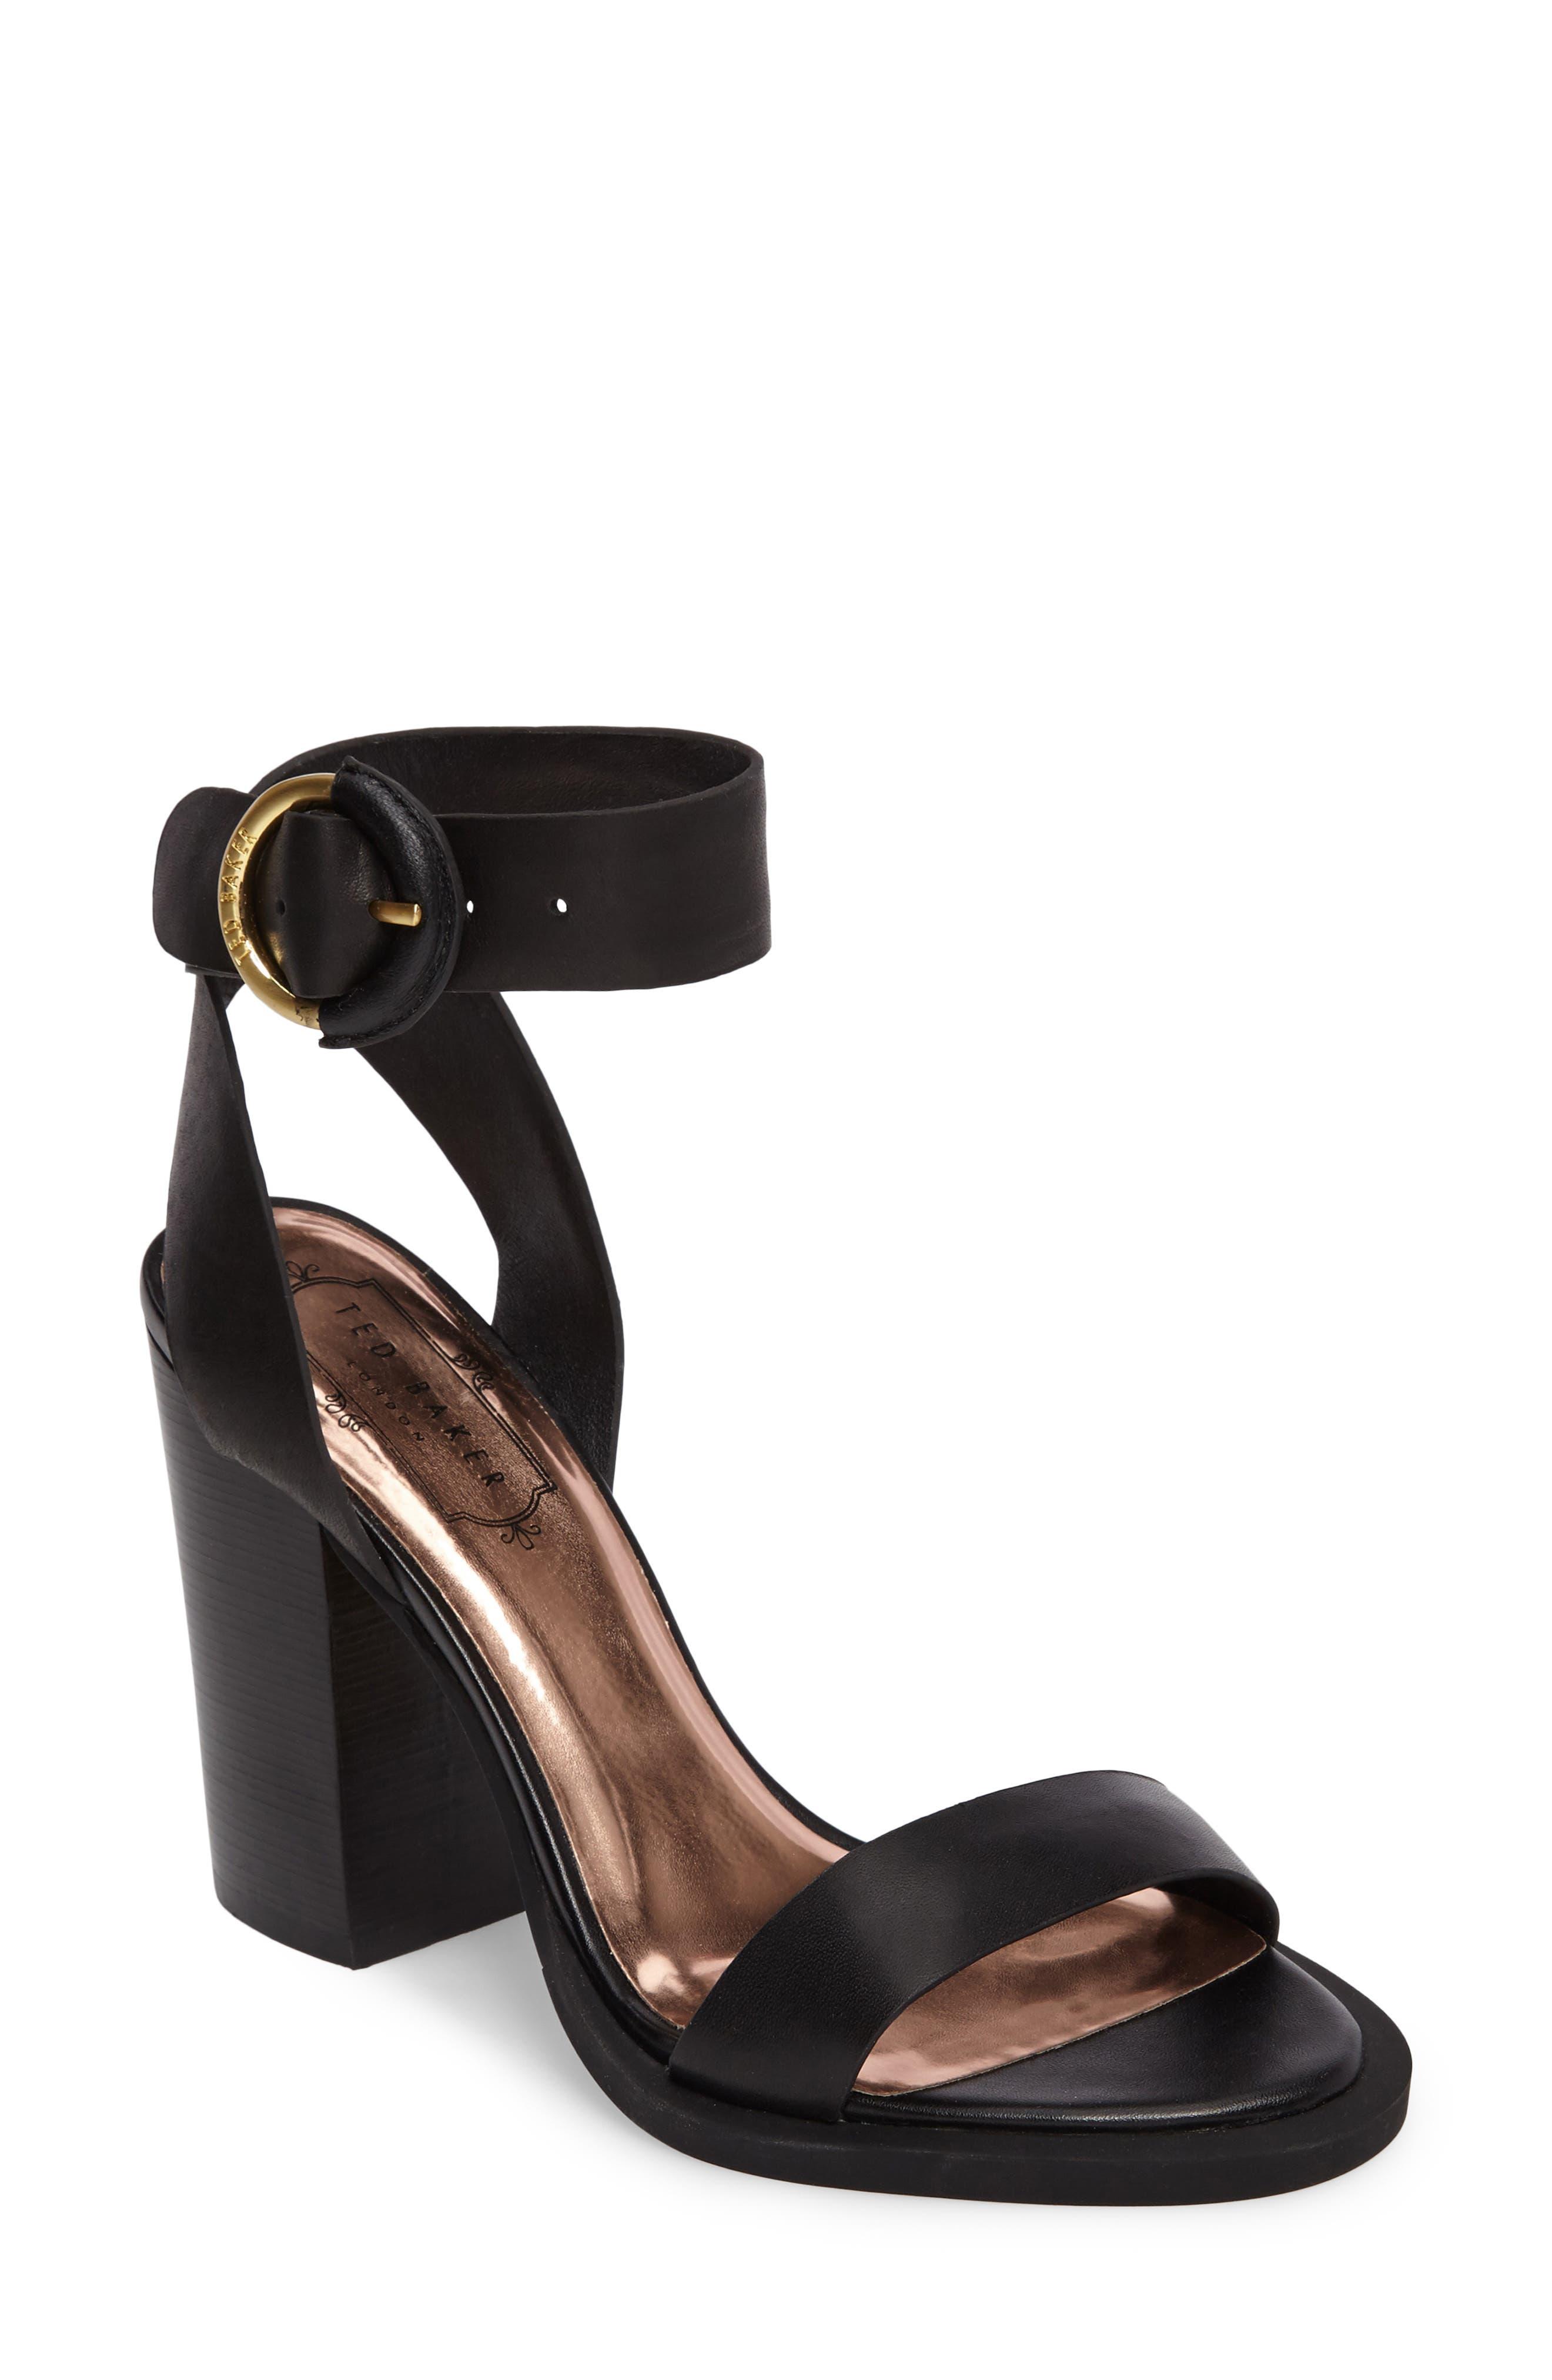 Betciy Ankle Strap Sandal,                             Main thumbnail 1, color,                             001